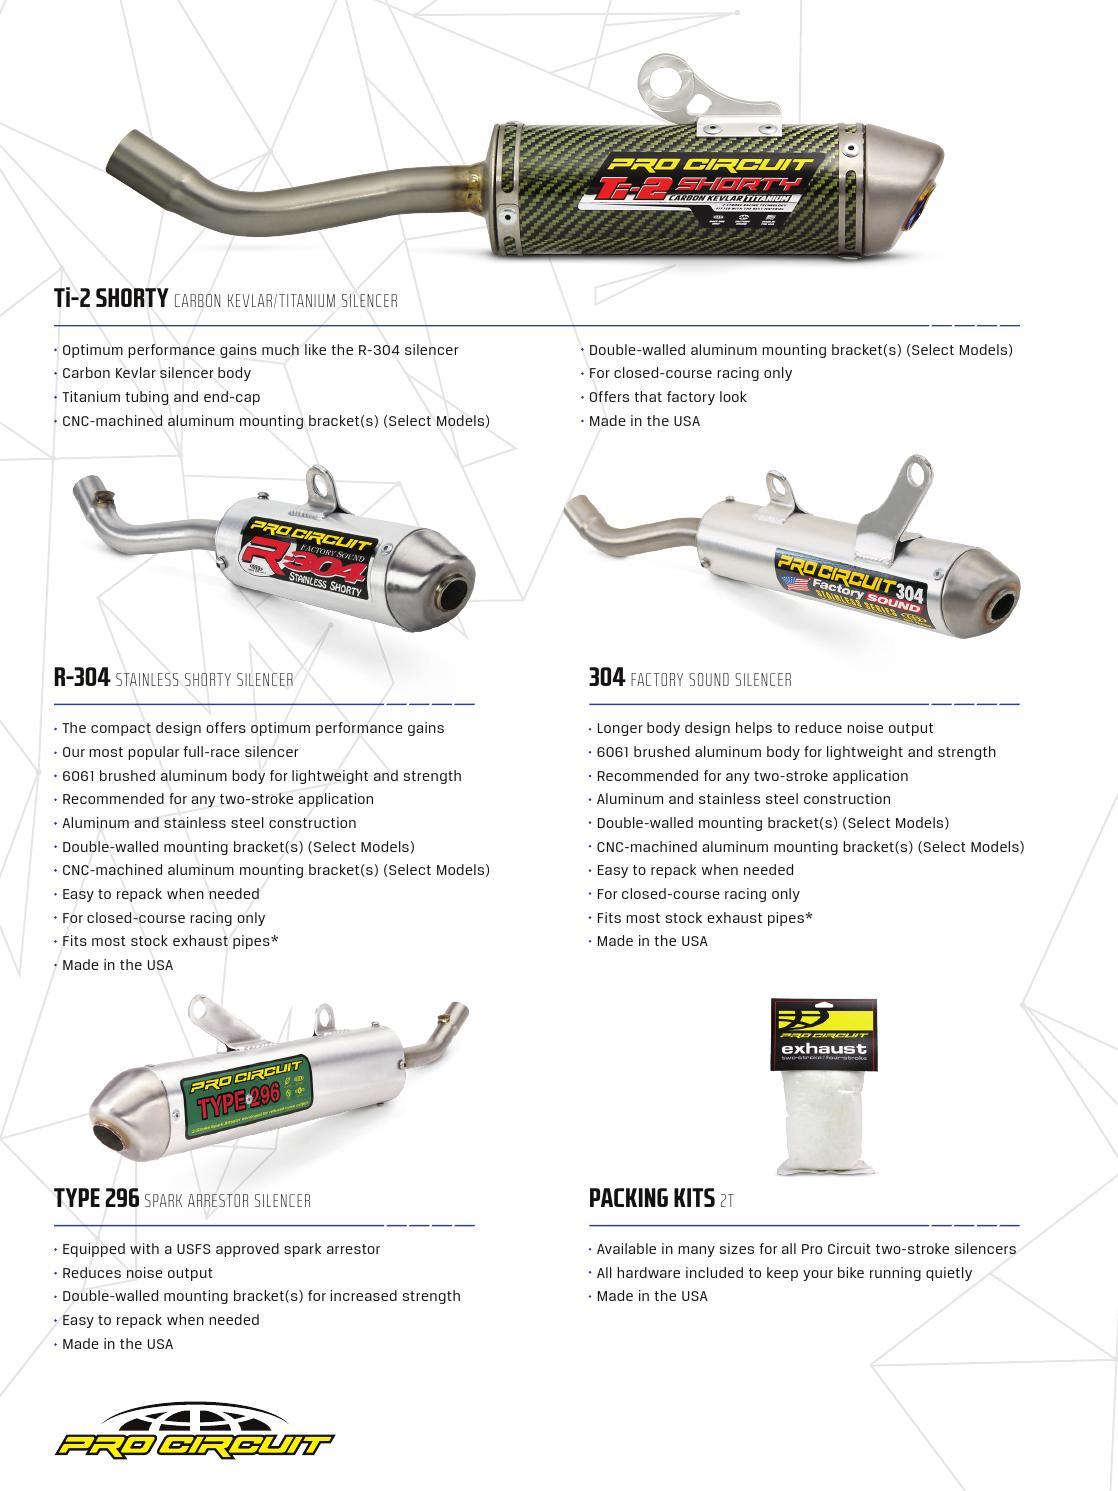 2016 Pro Circuit Australian Catalogue by Monza Imports - issuu